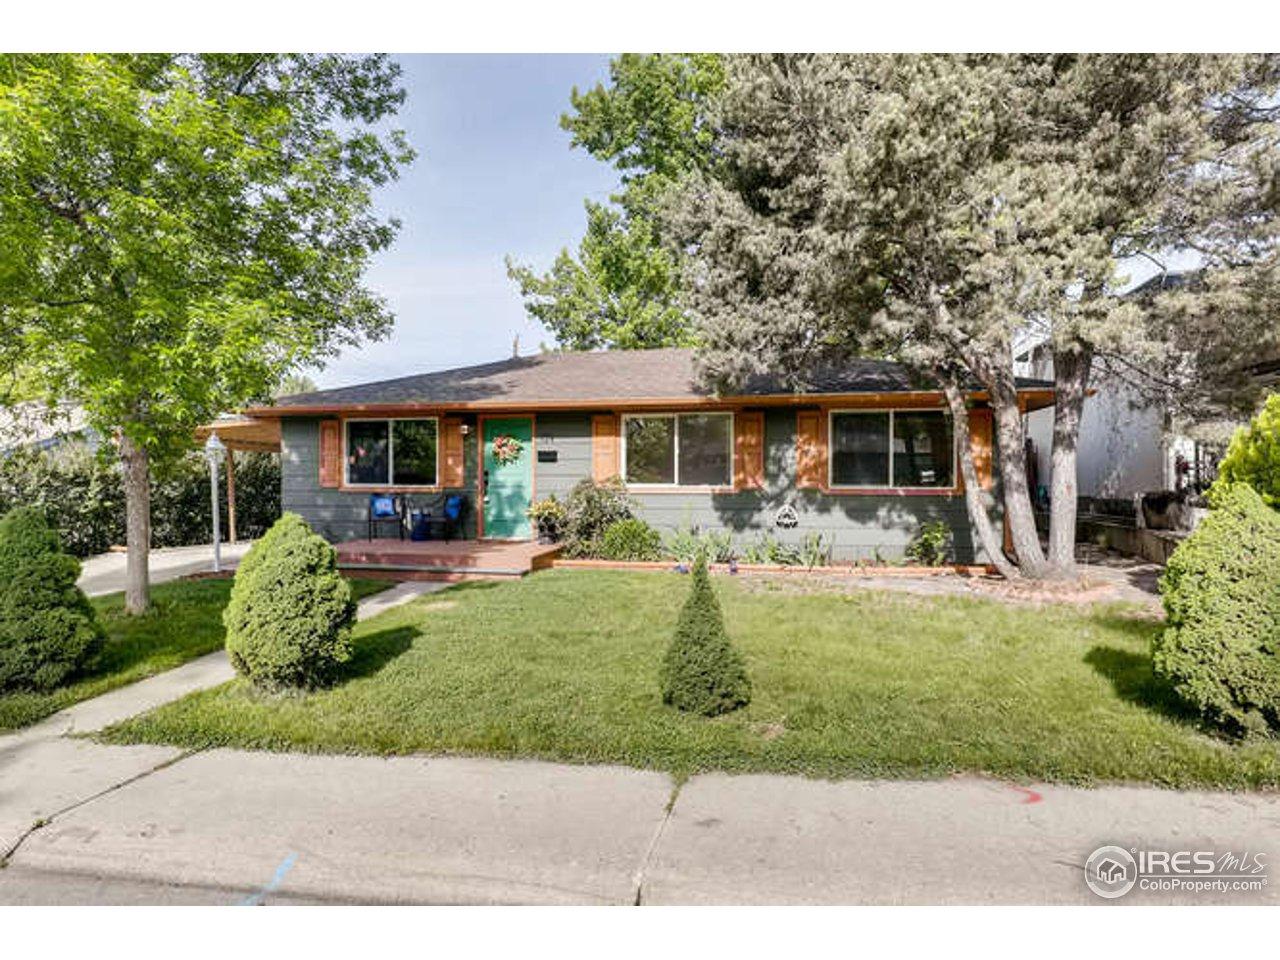 139 Grant St, Longmont CO 80501